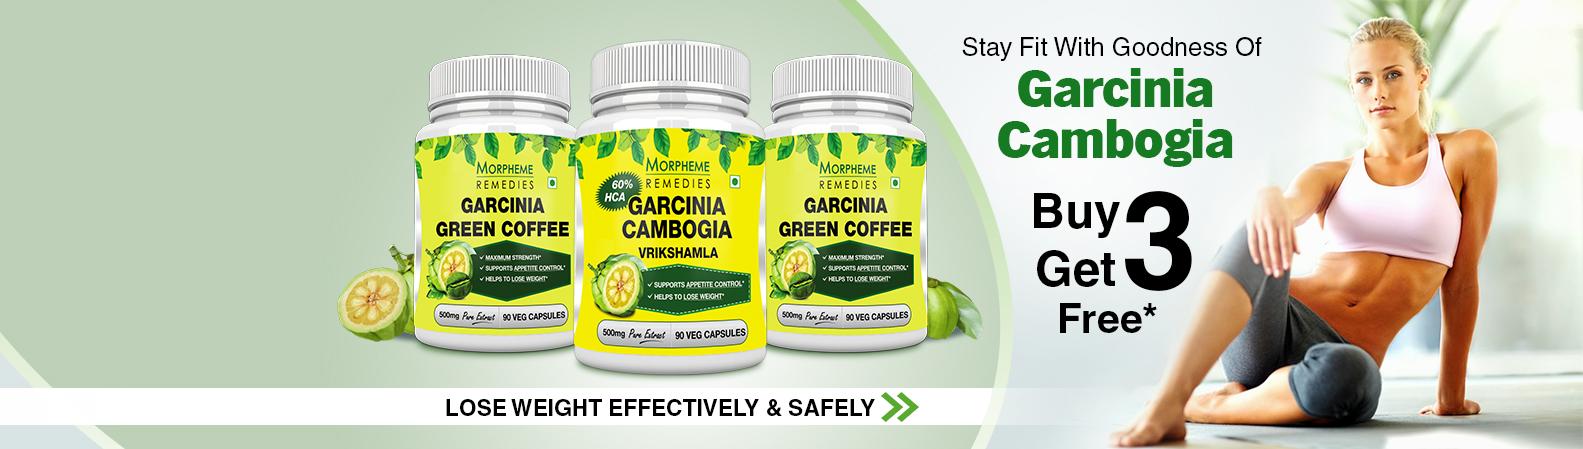 Garcinia-Cambogia-Sliding-Banners